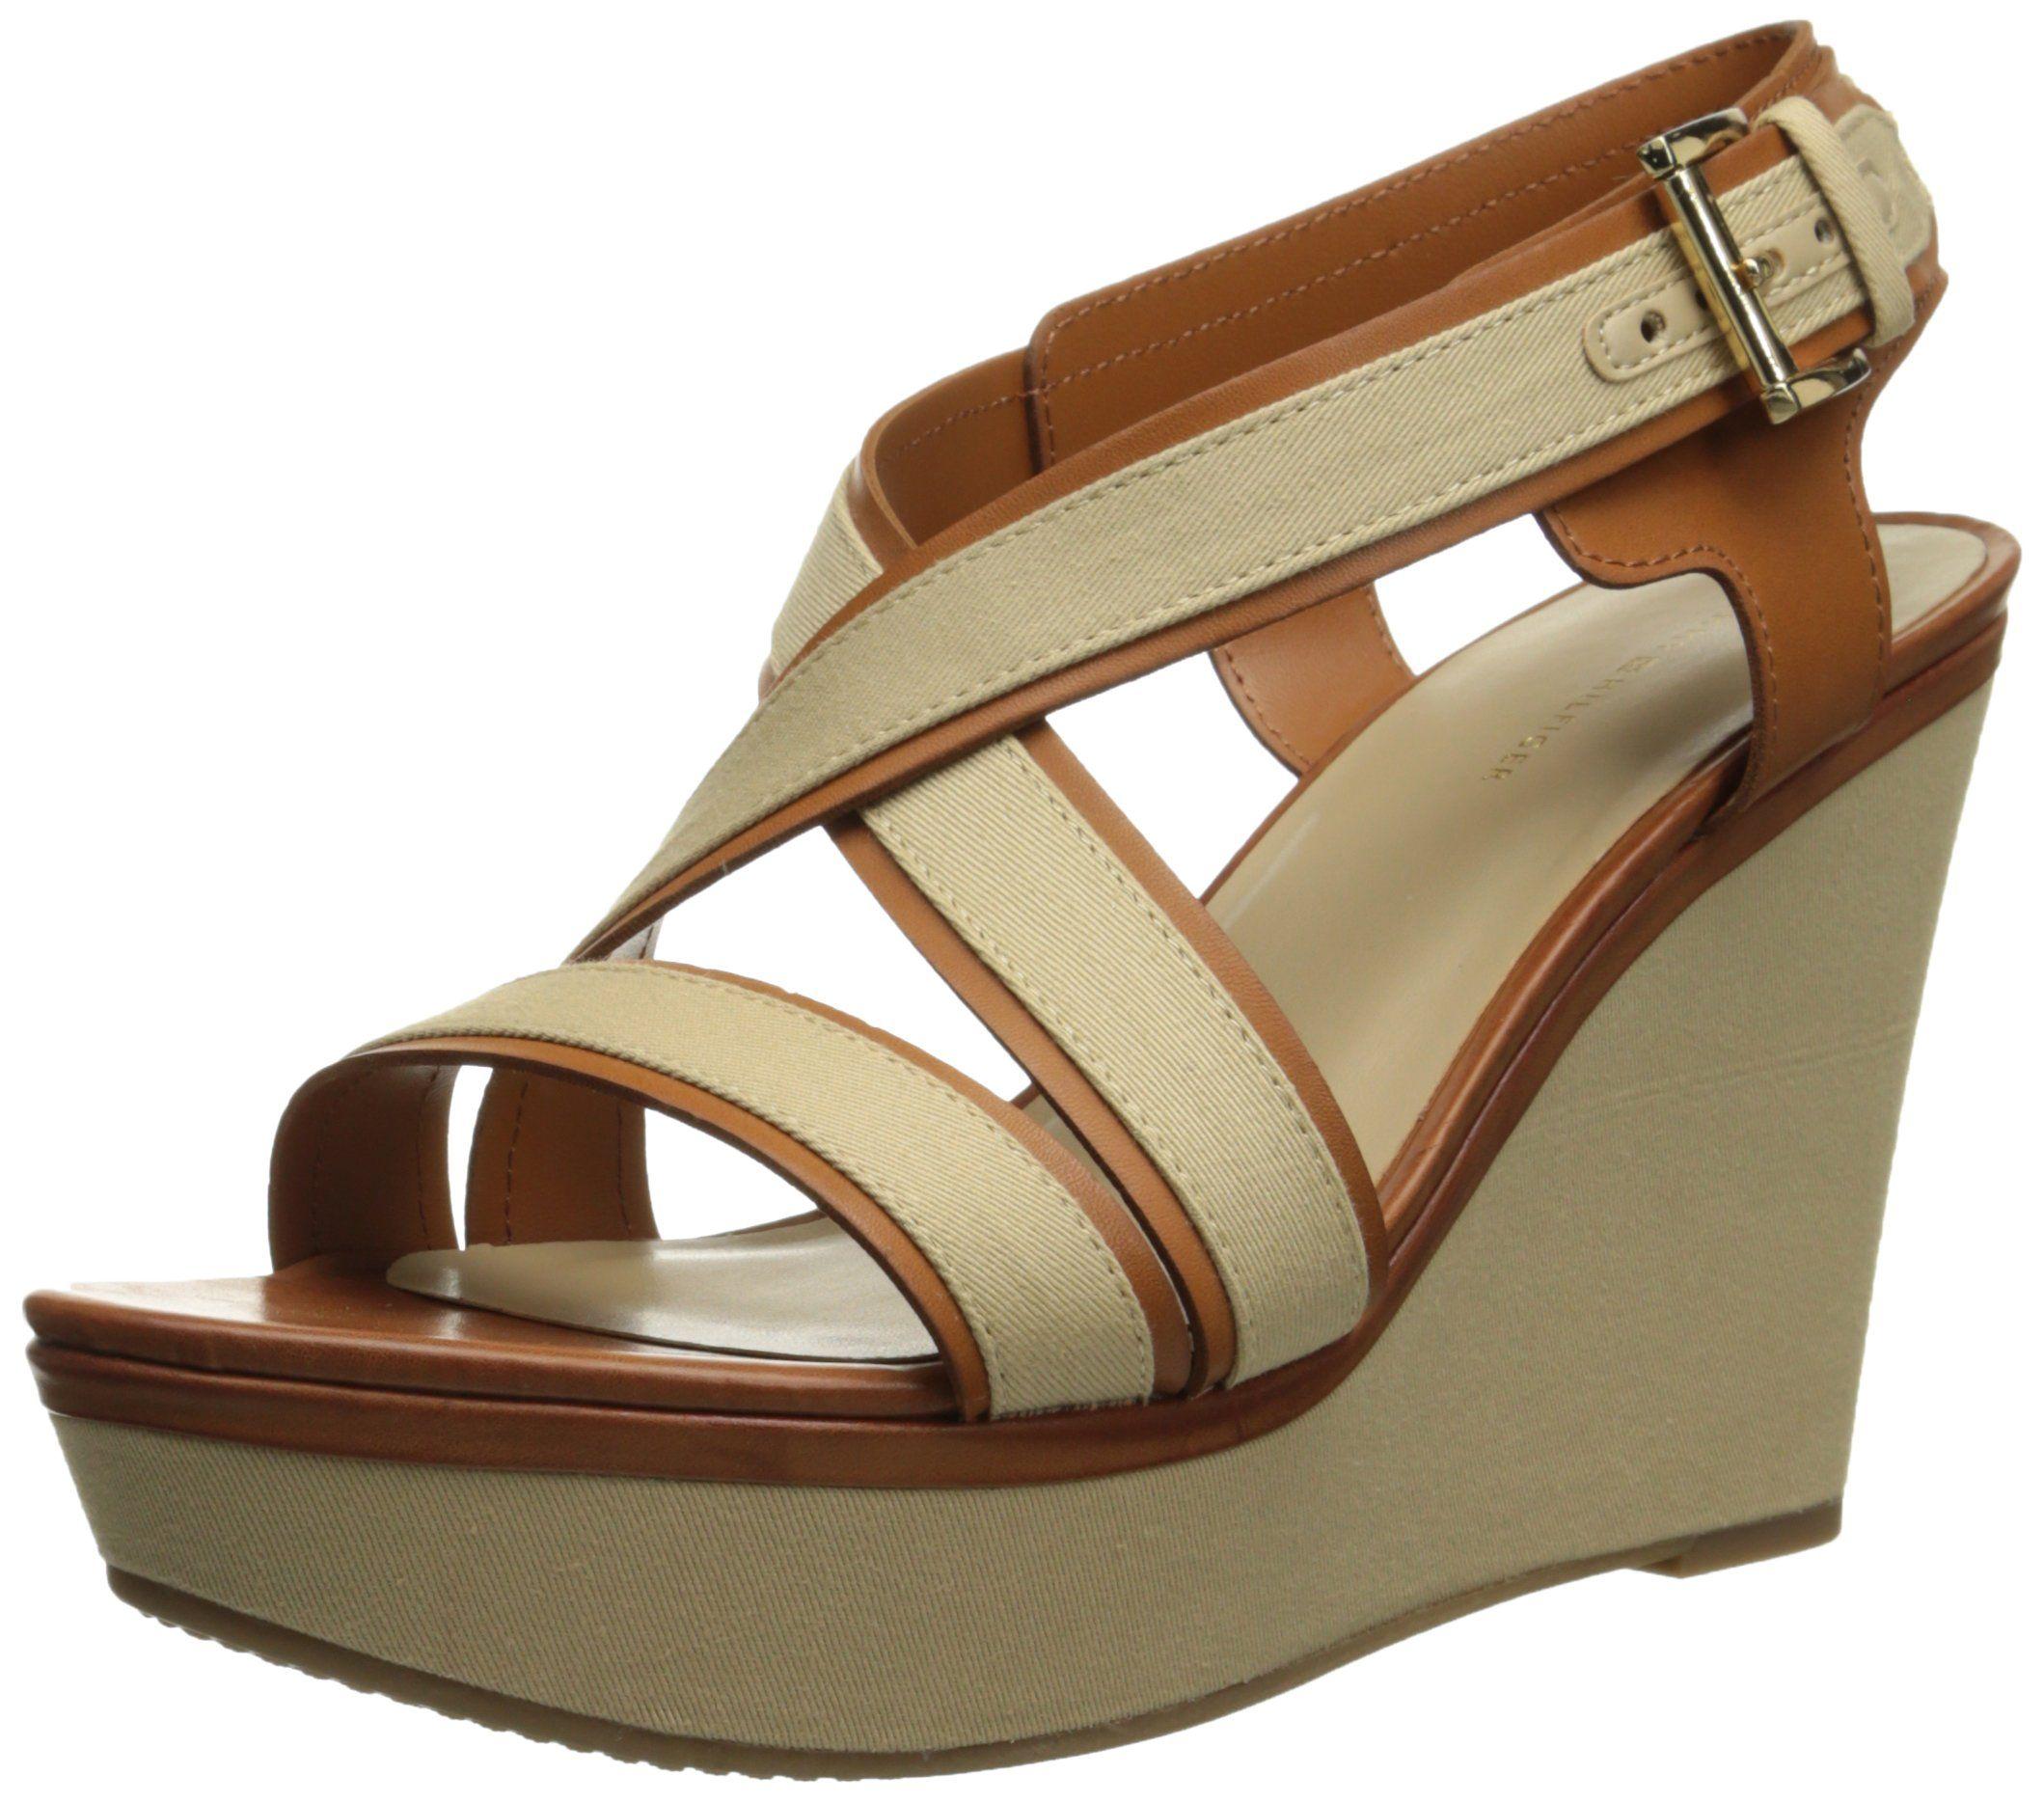 546110824e7f3 Amazon.com: Tommy Hilfiger Women's Safiah Wedge Sandal: Clothing ...